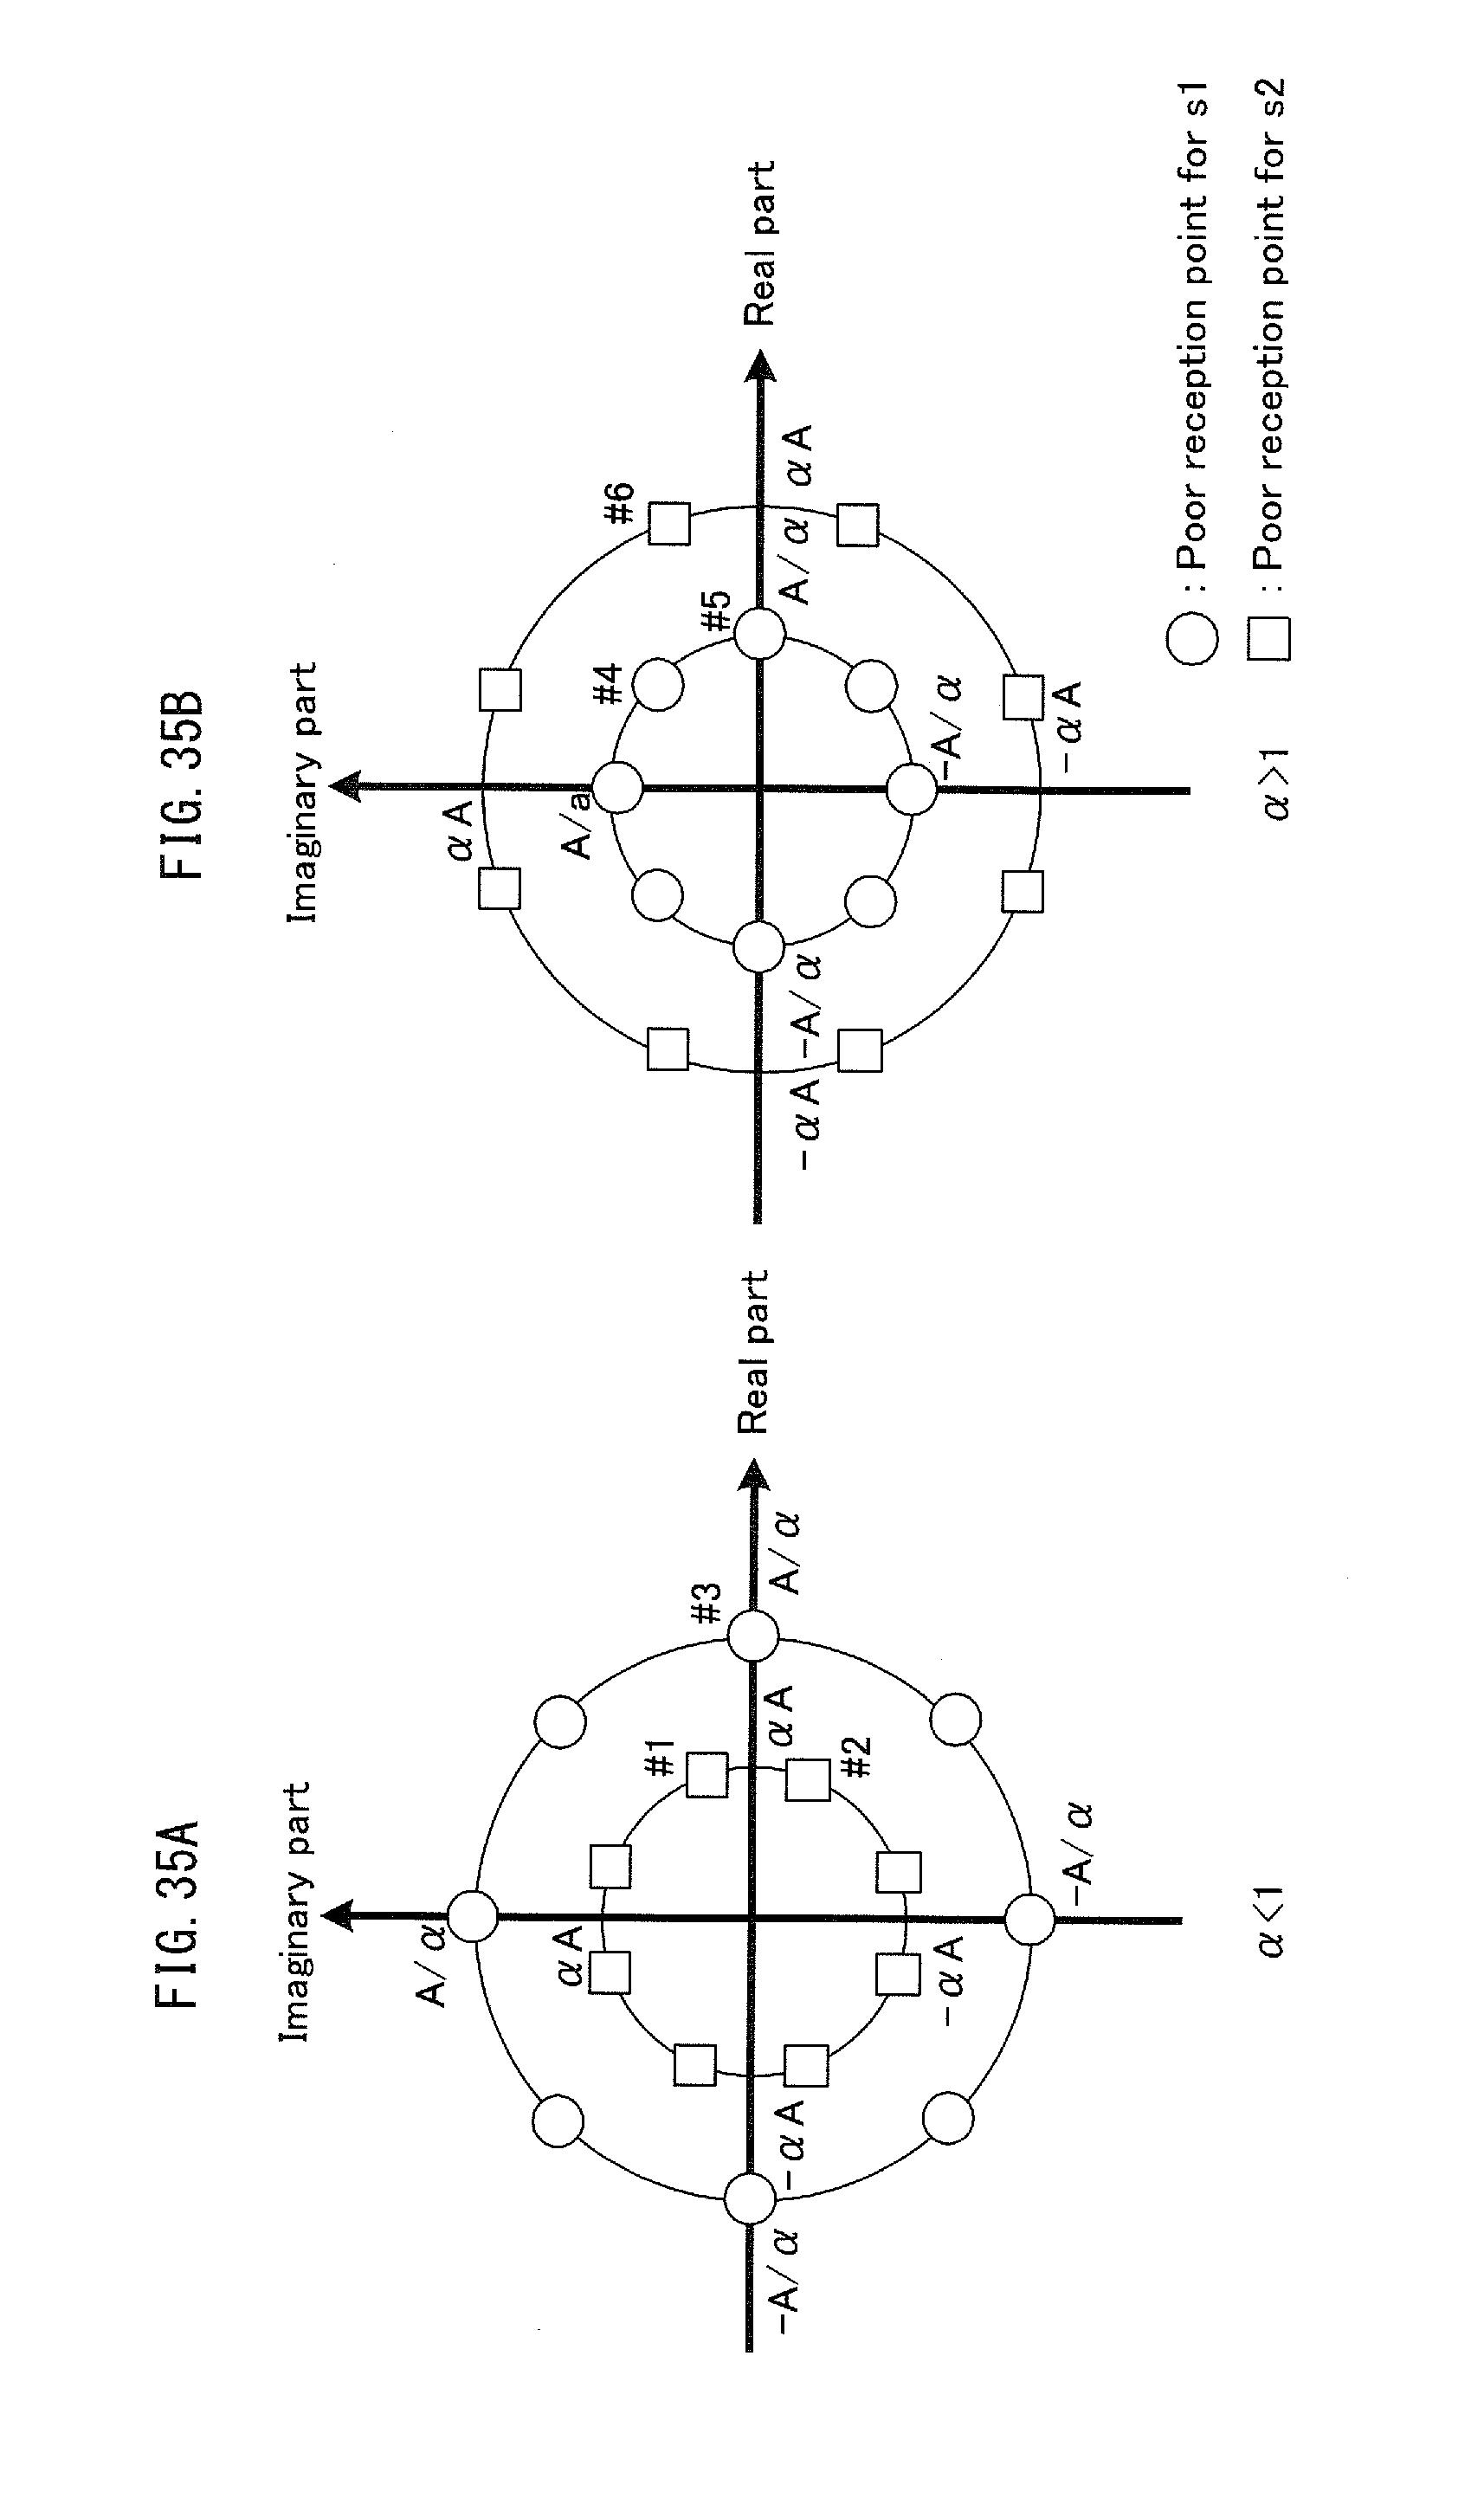 lcd-32ca6电路图